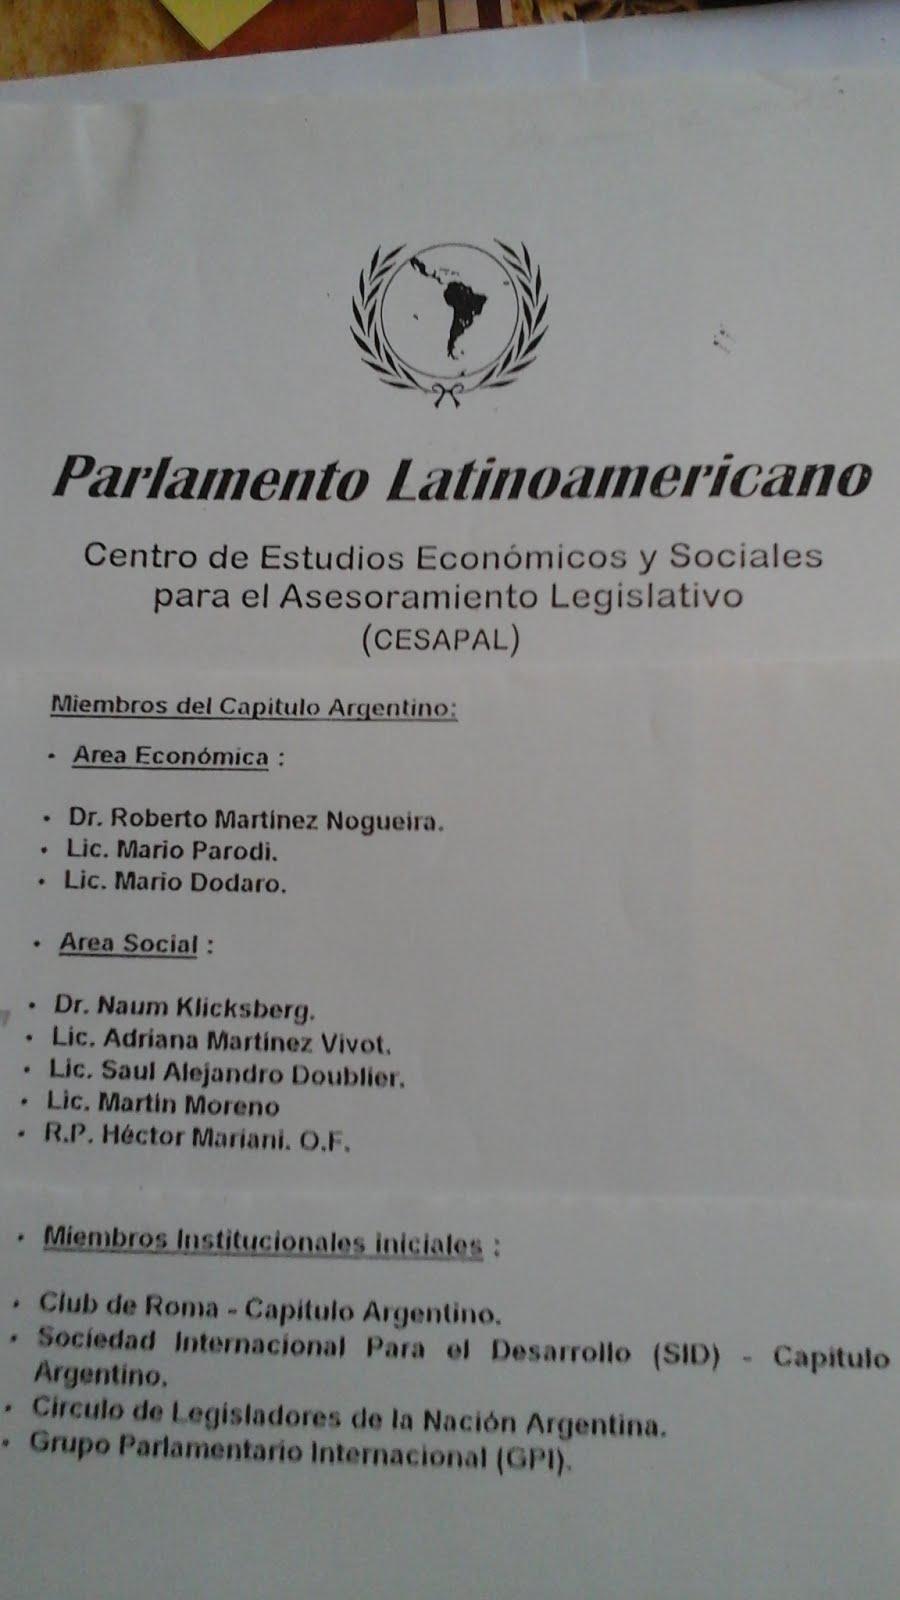 70 - Naum Kliksberg como asesor del Parlamento Latinoamericano. Argentina.1998.